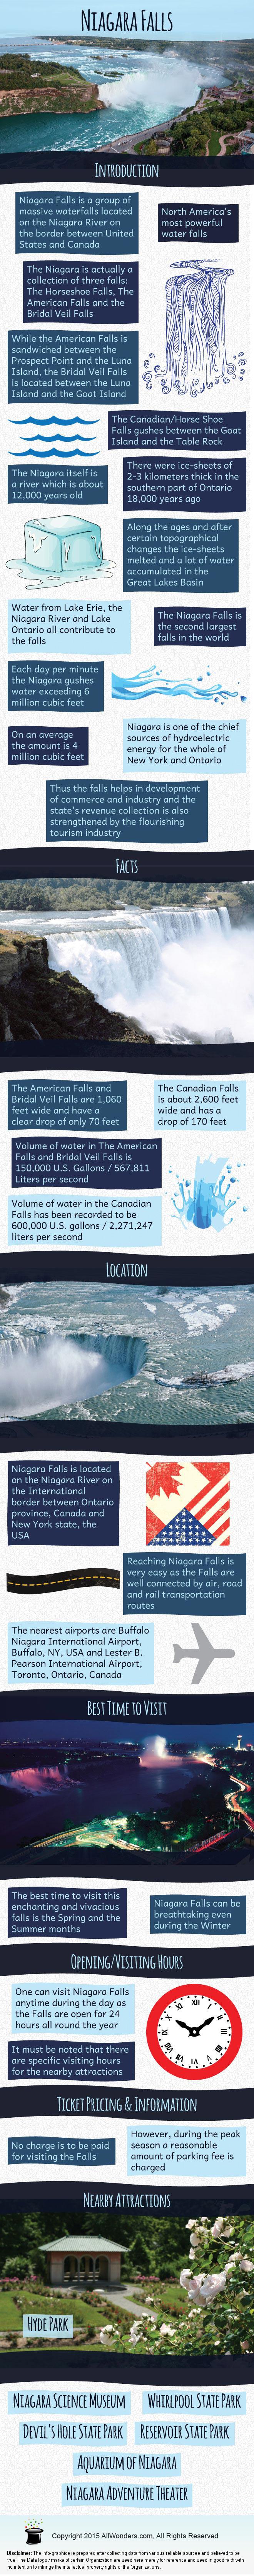 Niagara Falls Infographic